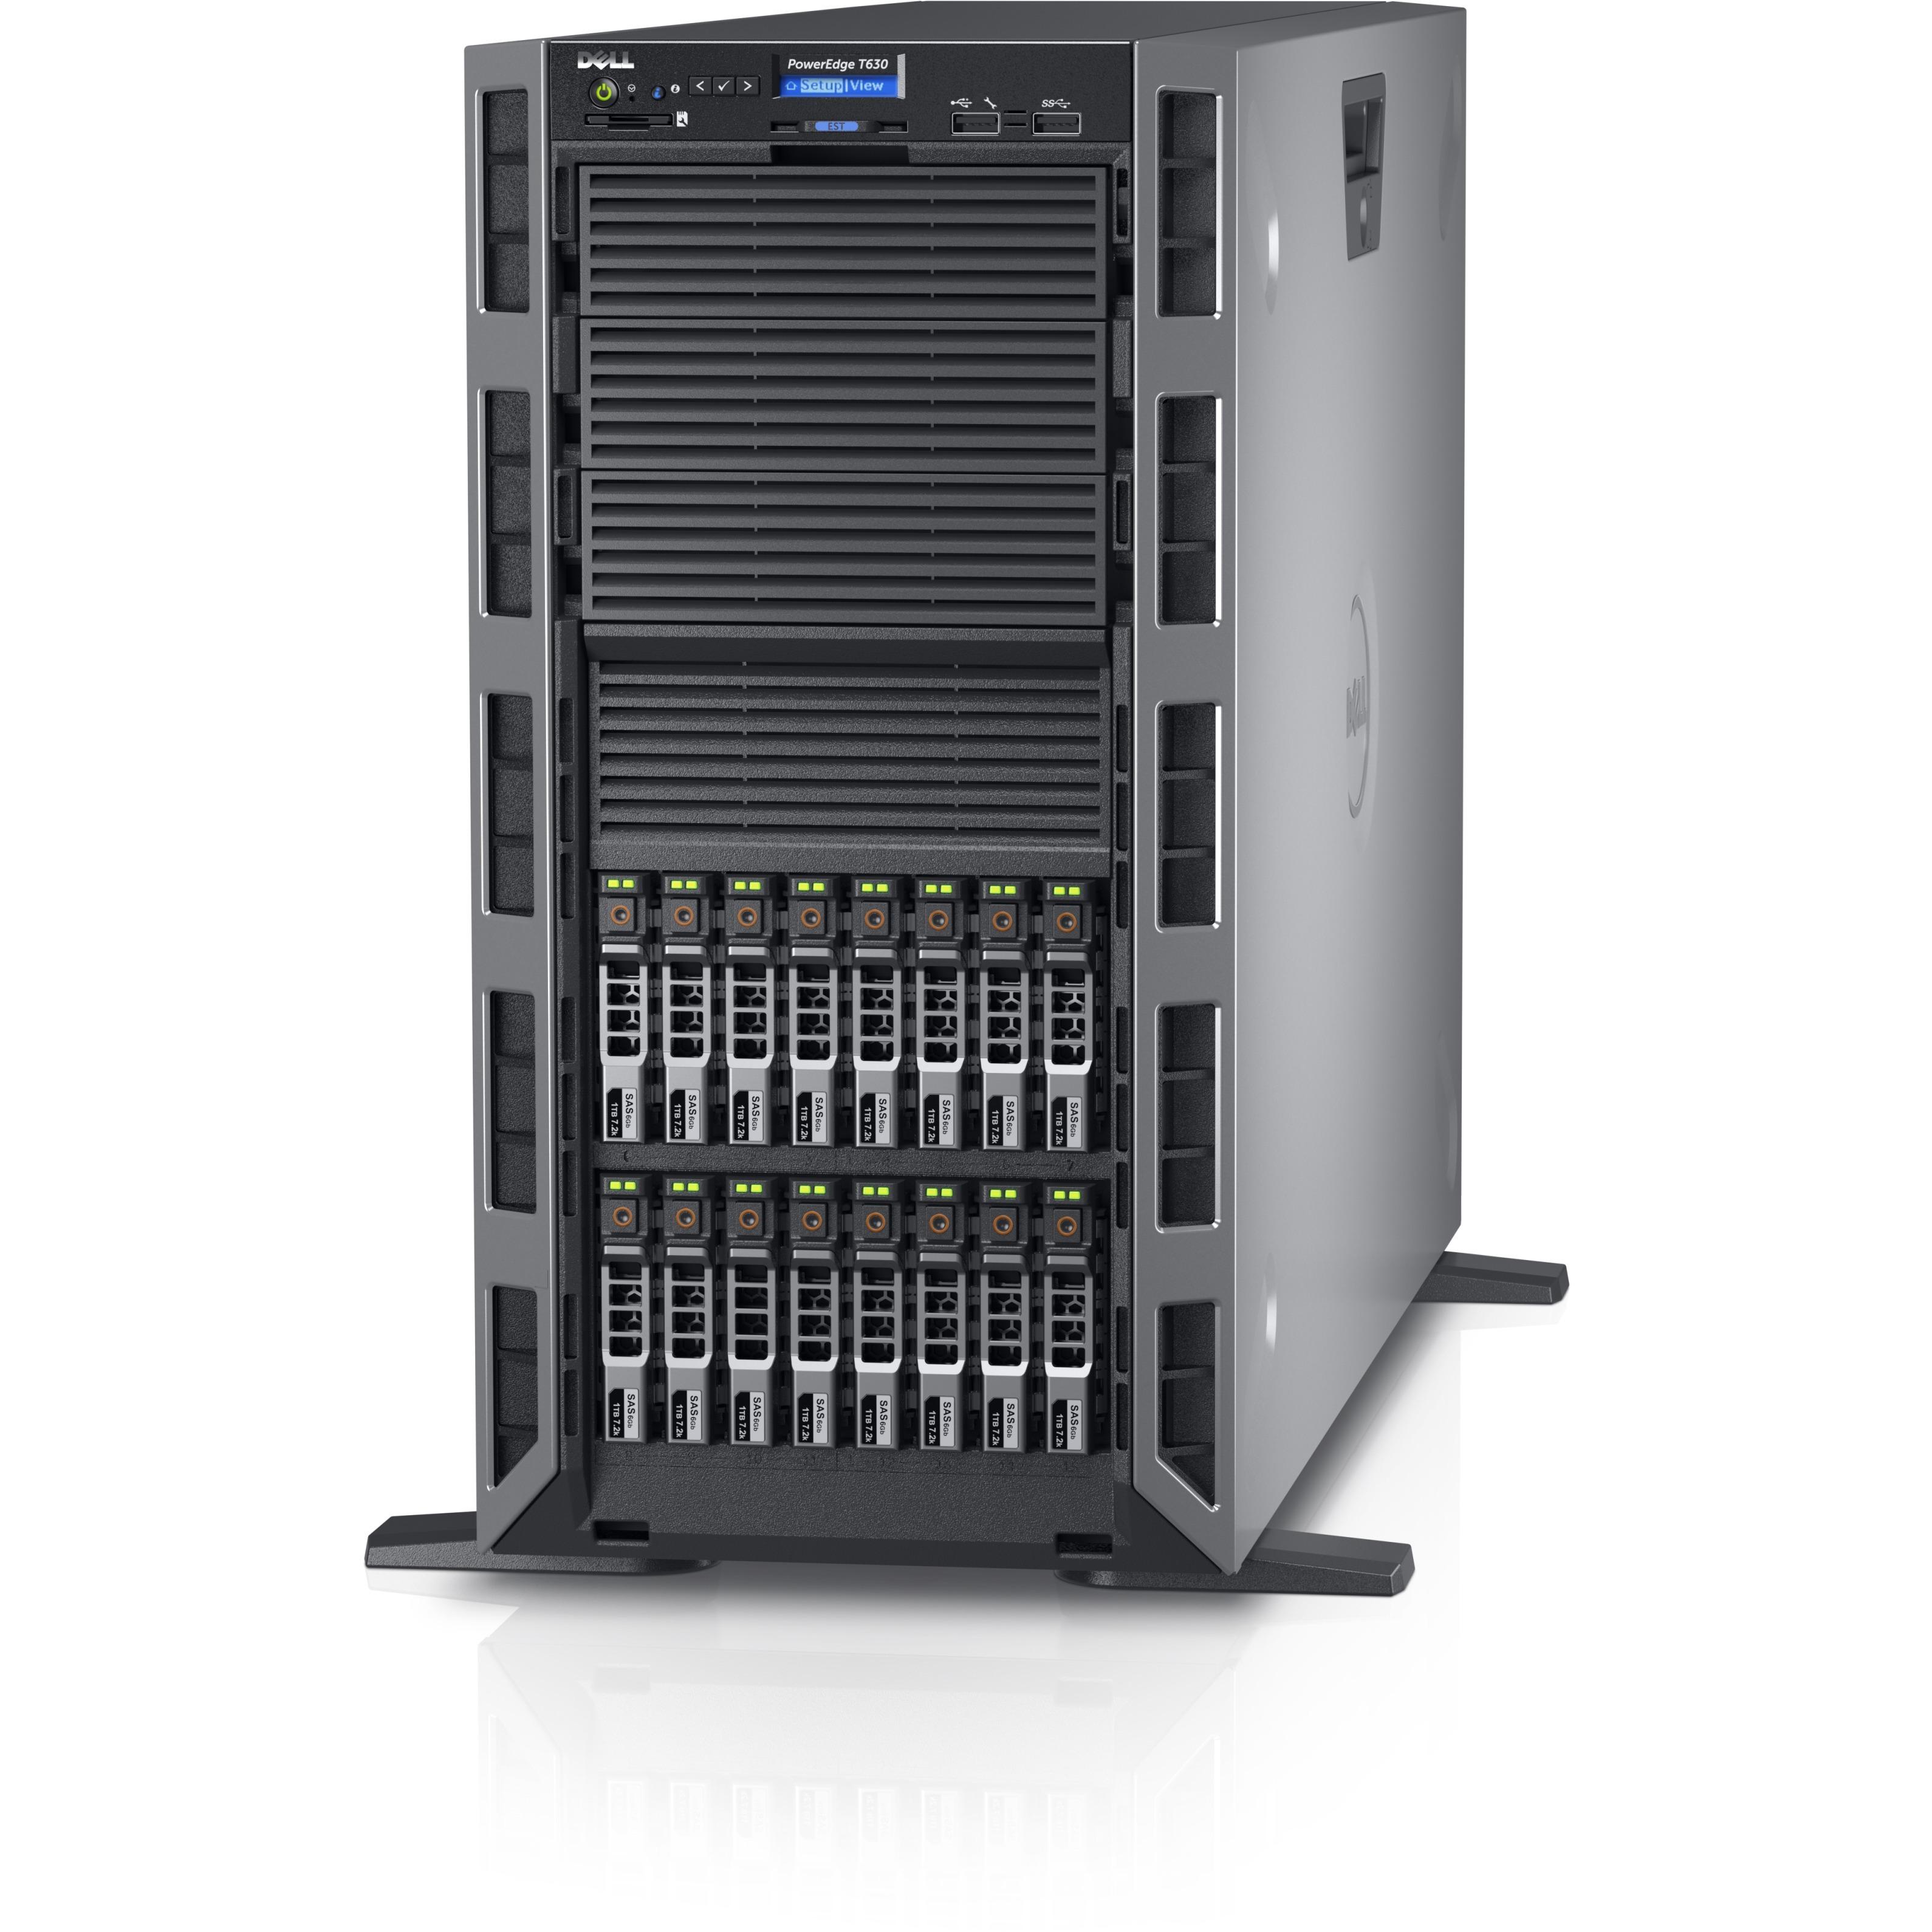 new dell poweredge t630 5u tower server 1 x intel xeon e5 2620 v4 octa core 8 ebay. Black Bedroom Furniture Sets. Home Design Ideas